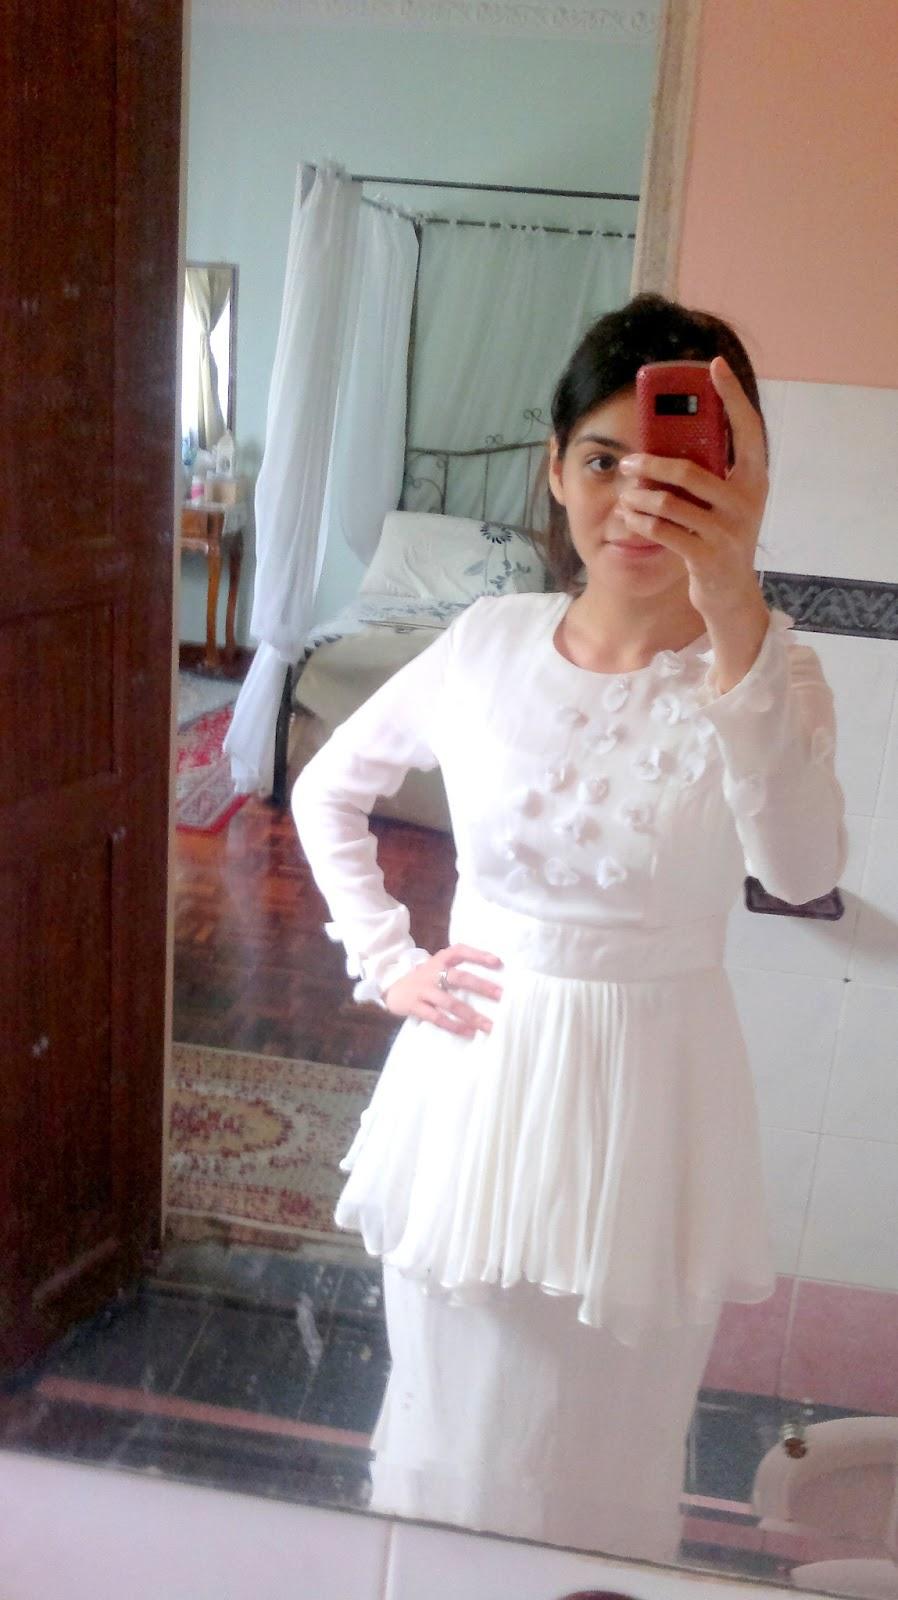 Lepas tu, pergi almari test baju nikah haritu….vahahha…from Nurita